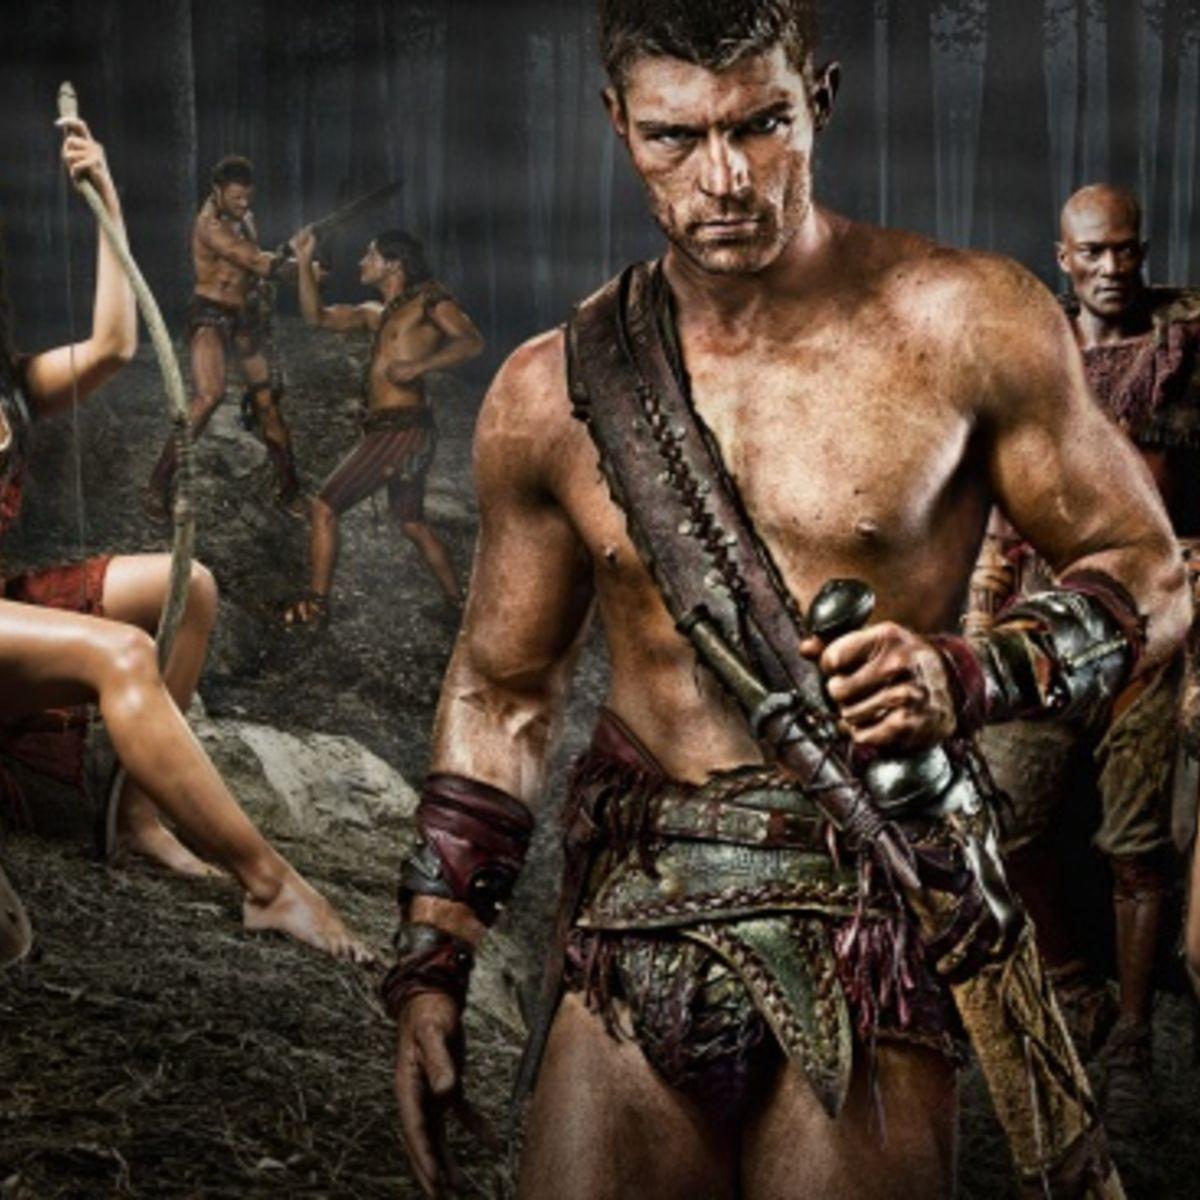 SpartacusVengeancePromoArt.jpg